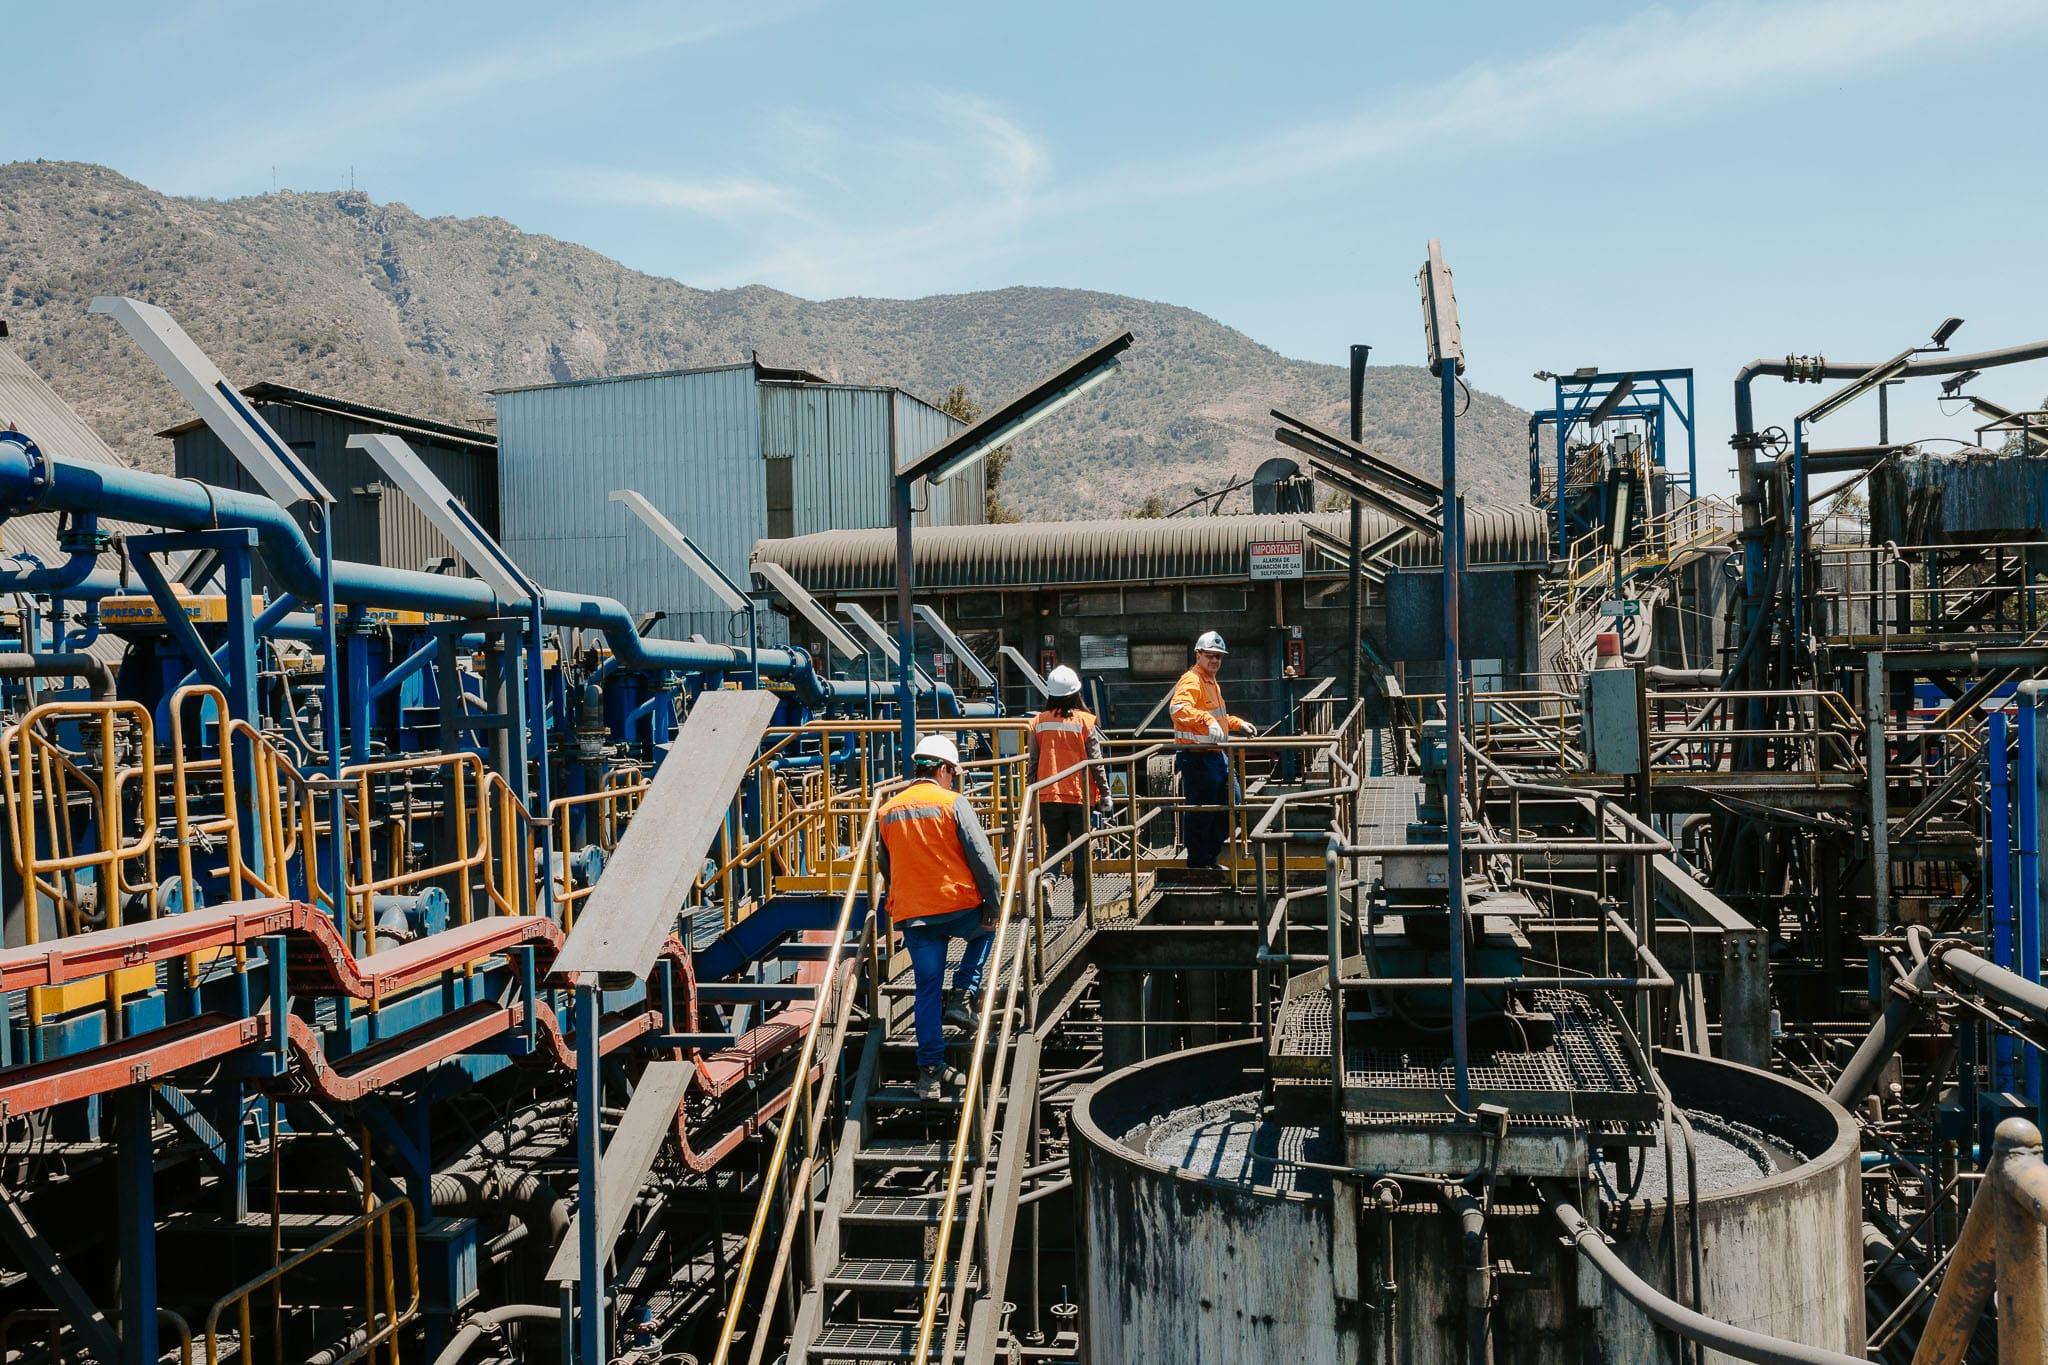 minera-valle-central-chile-centro-nacional-pilotaje-planta-rancagua-region-bernardo-ohiggings-1